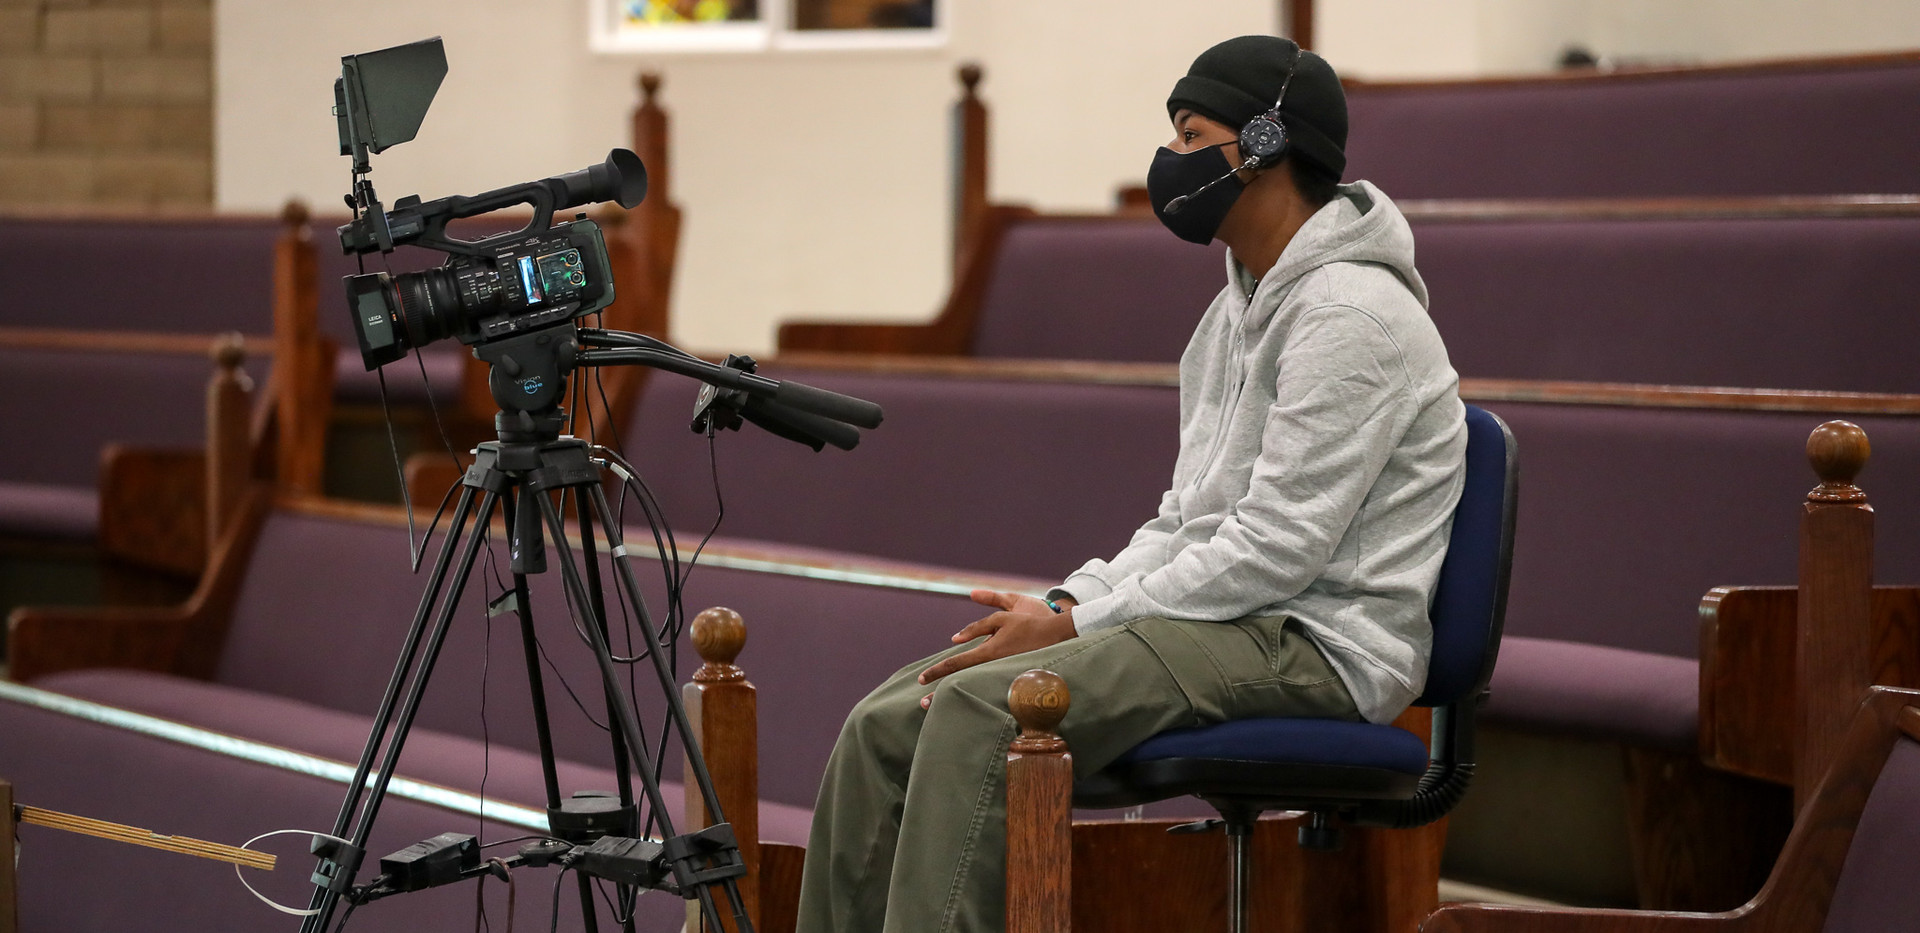 1/17/21 - Emmanuel Baptist Church - San Jose, CA - 8